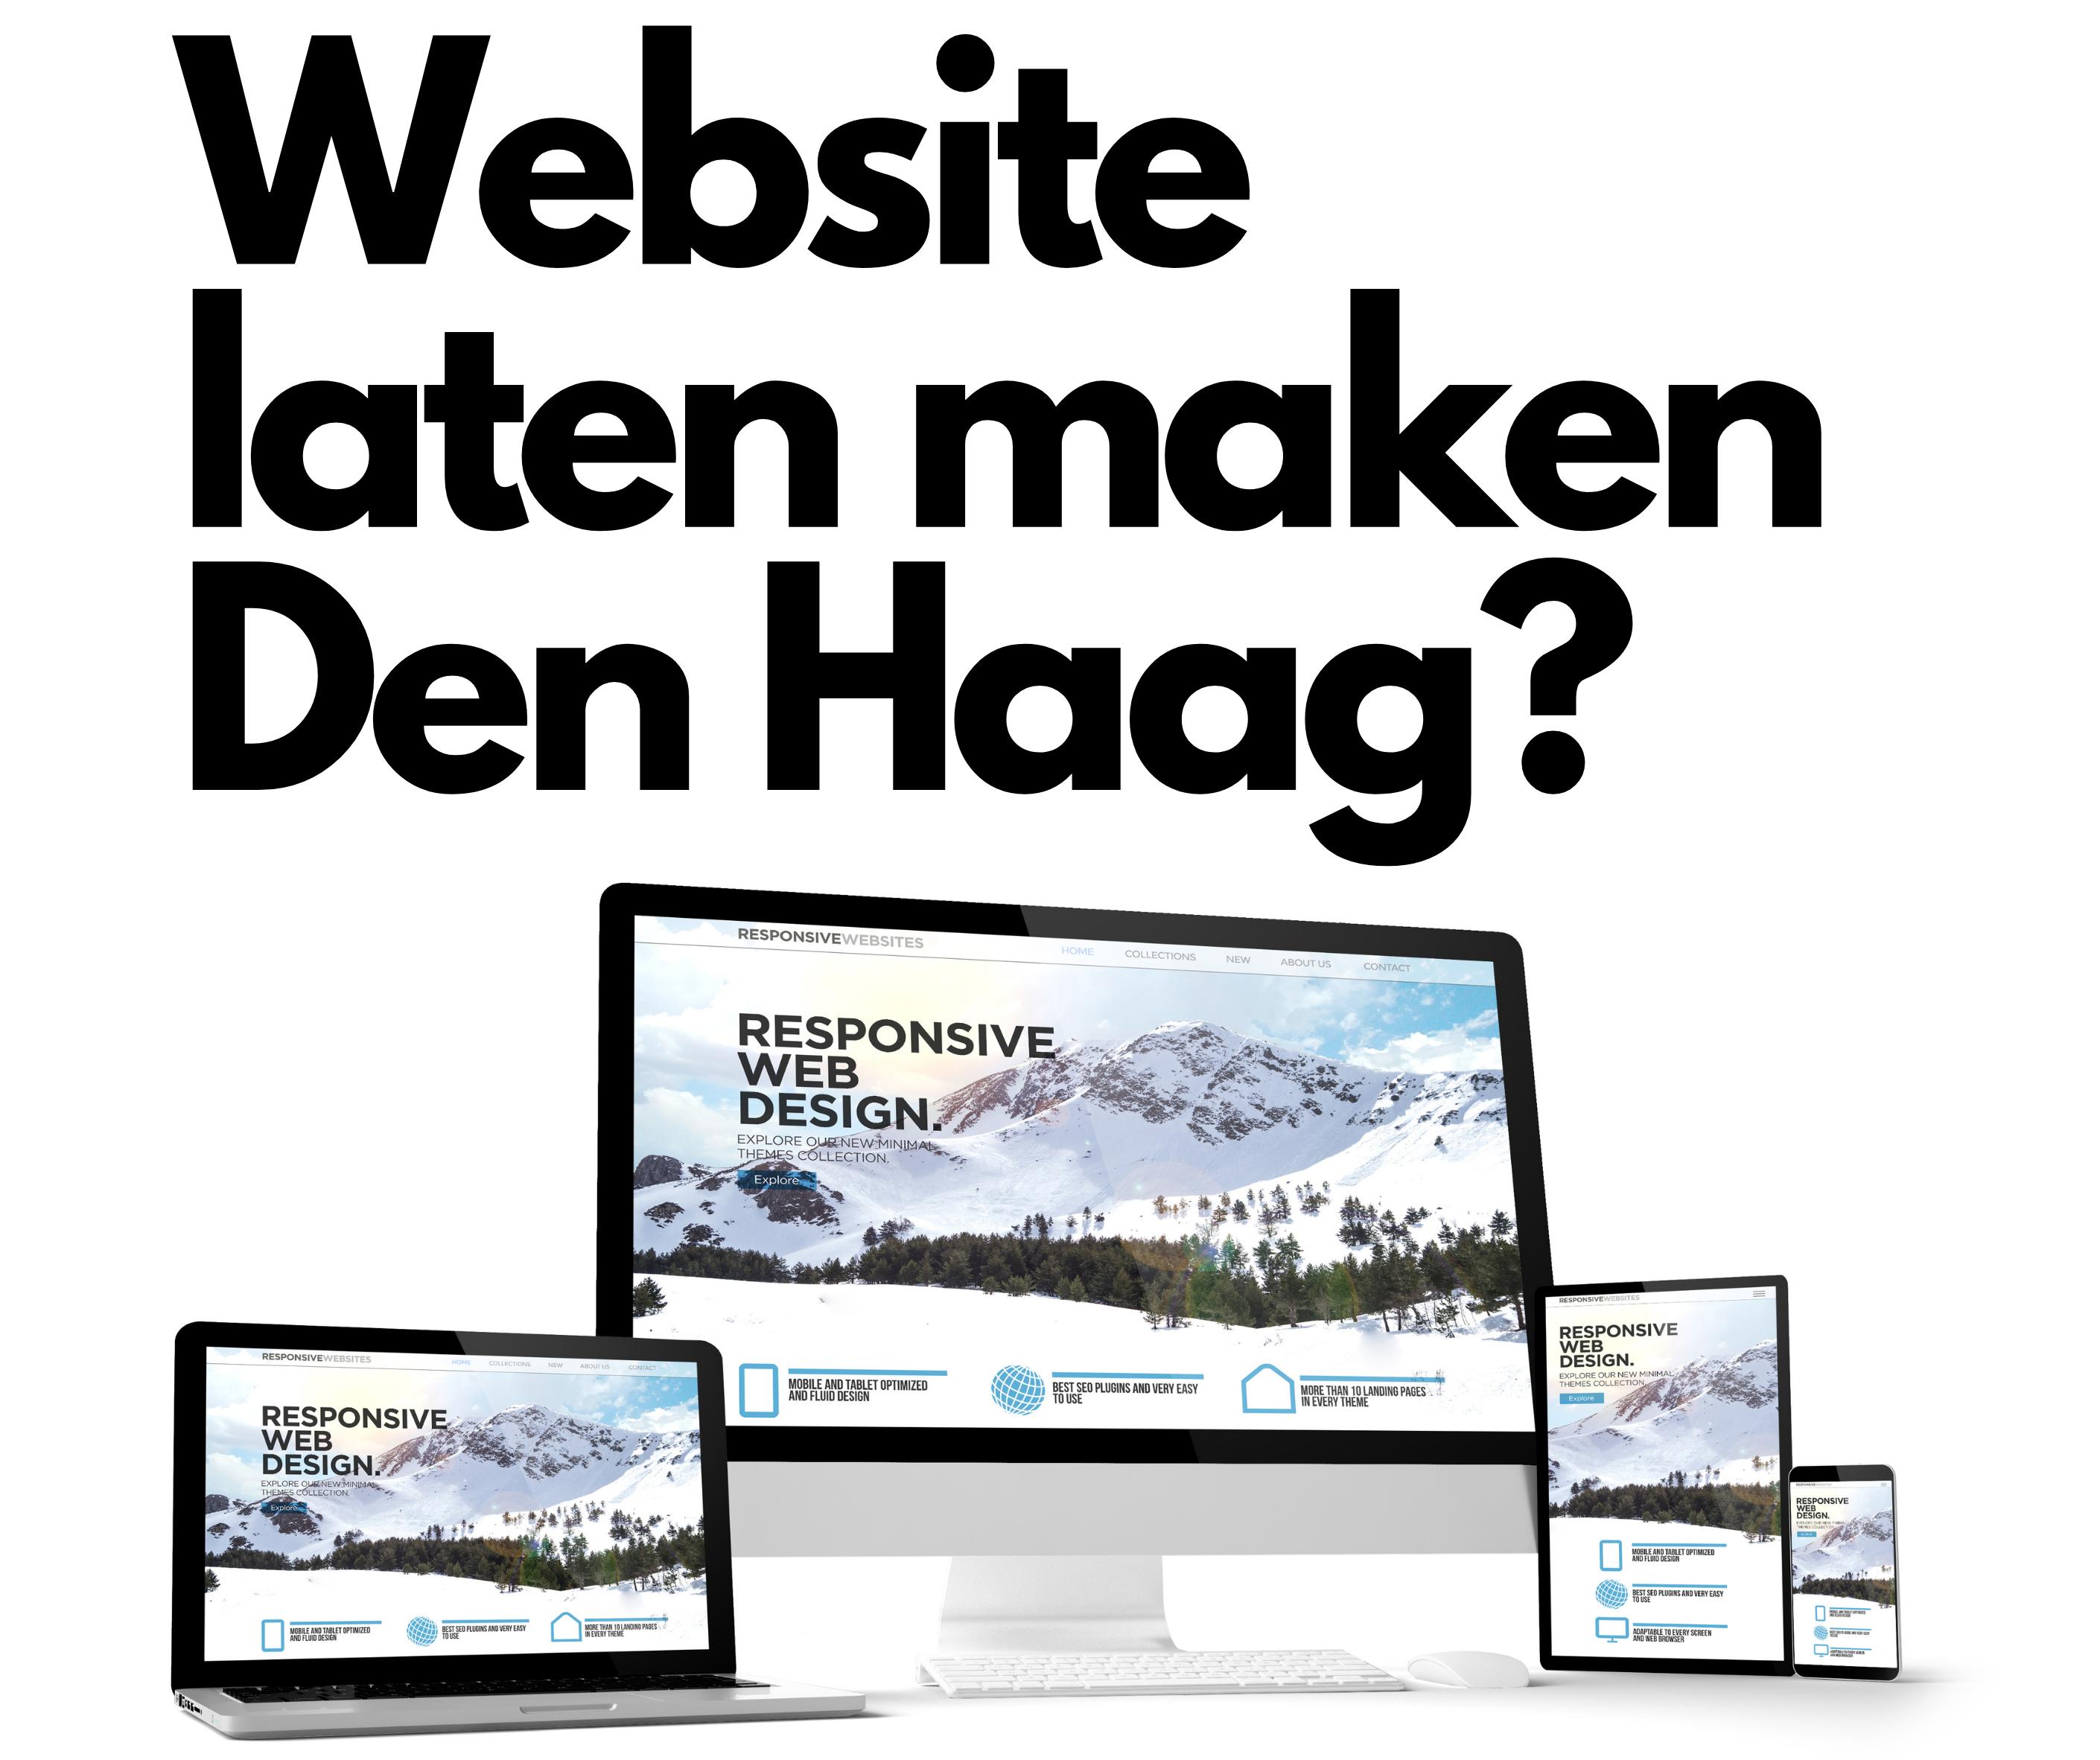 Website laten maken Den Haag